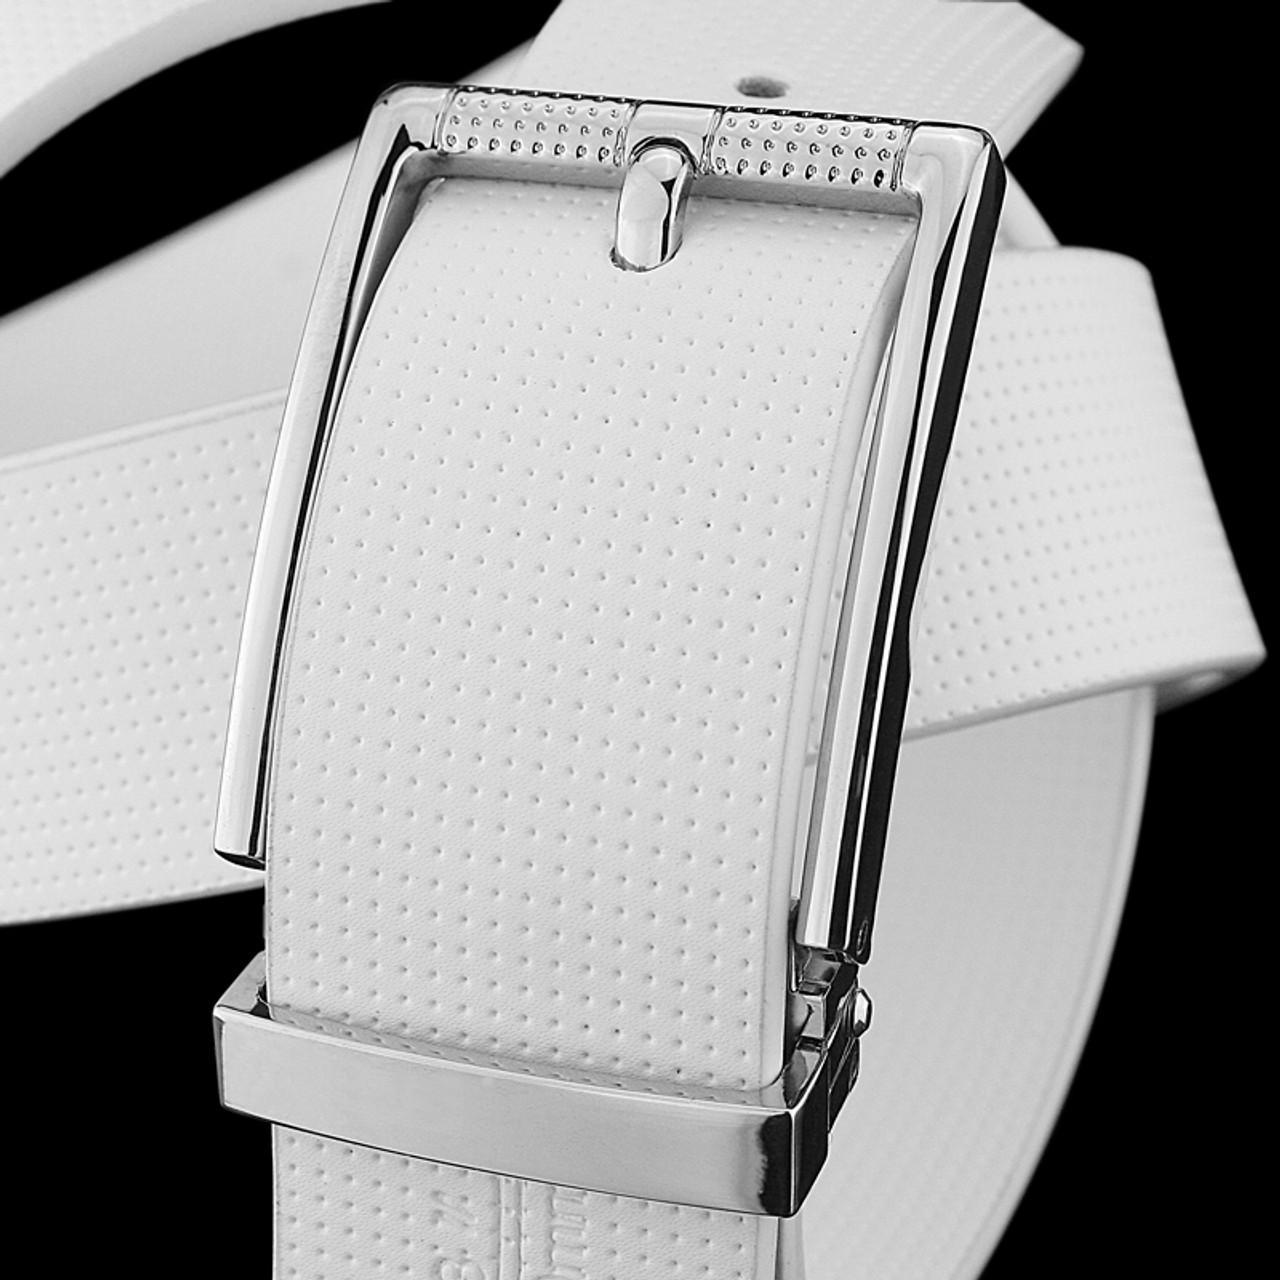 Taco Mocho K Letter Fashion Belt Mens Luxury Genuine Leather Designer Waist Strap Off White Ceinture Homme Casual